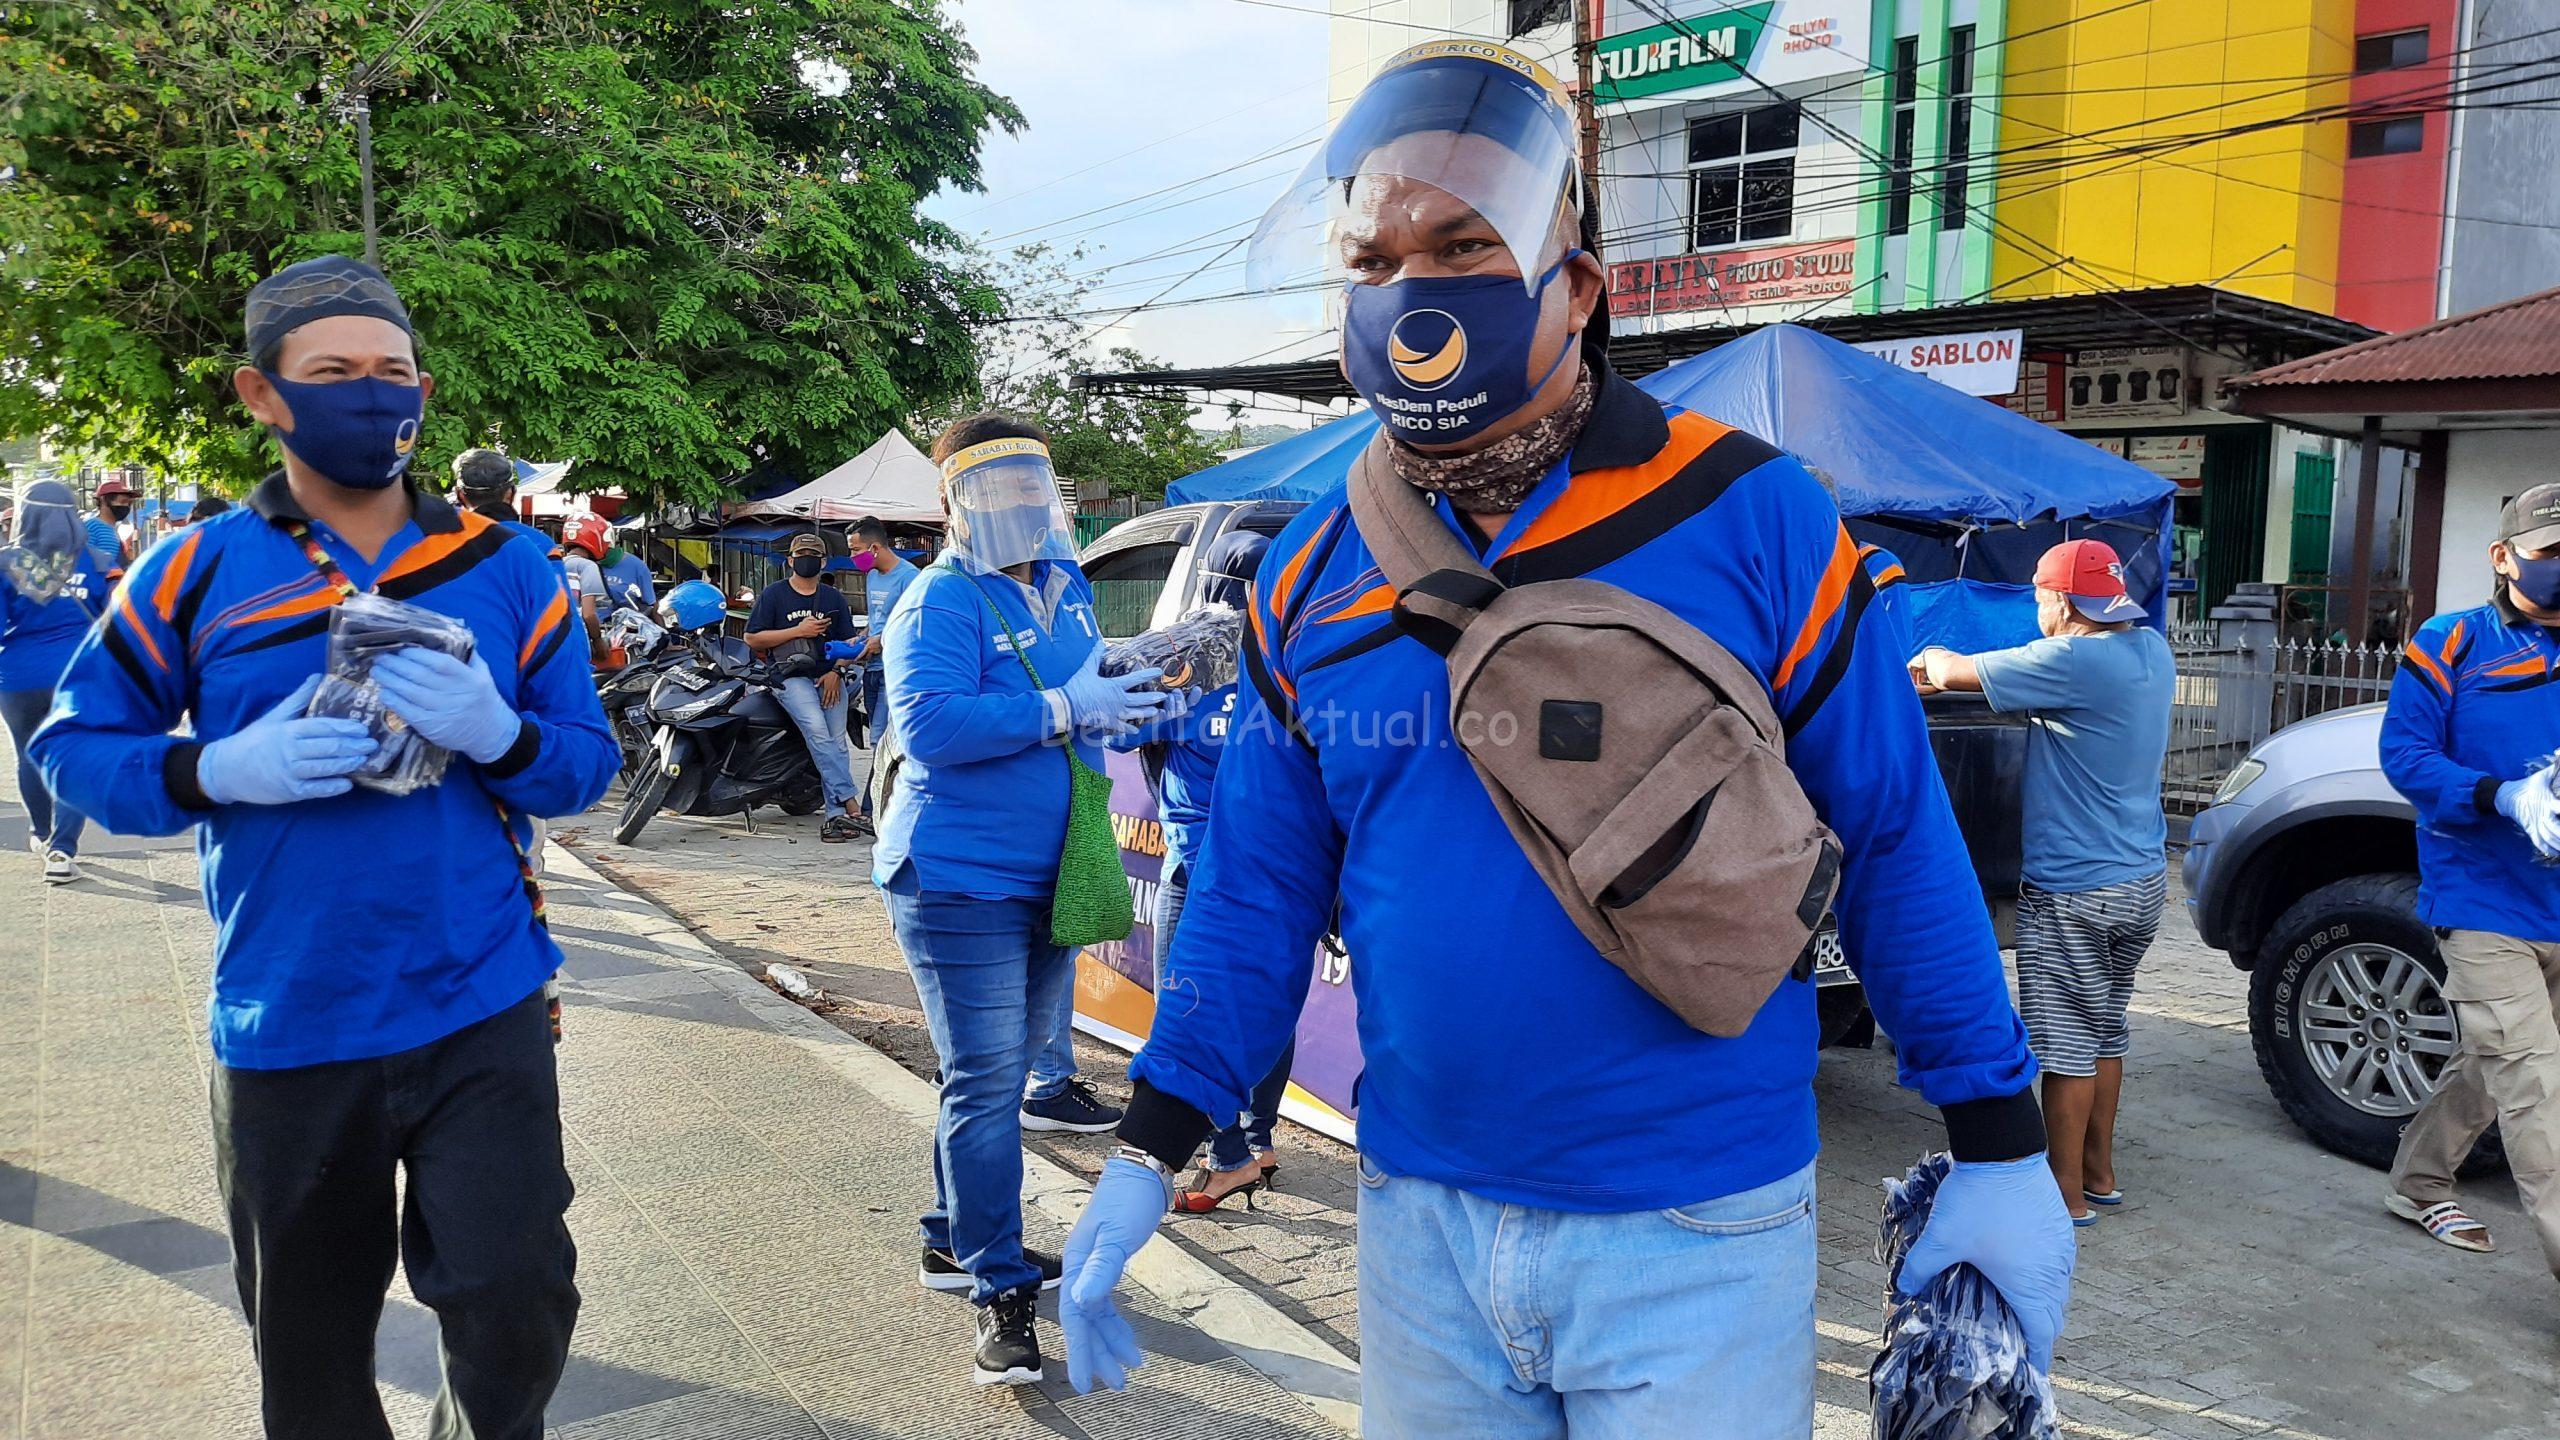 Peduli Corona, Partai NasDem Dan Sahabat Rico Sia Bagi APD Serta Takjil di Terminal Kota Sorong 4 20200503 170841 1 scaled